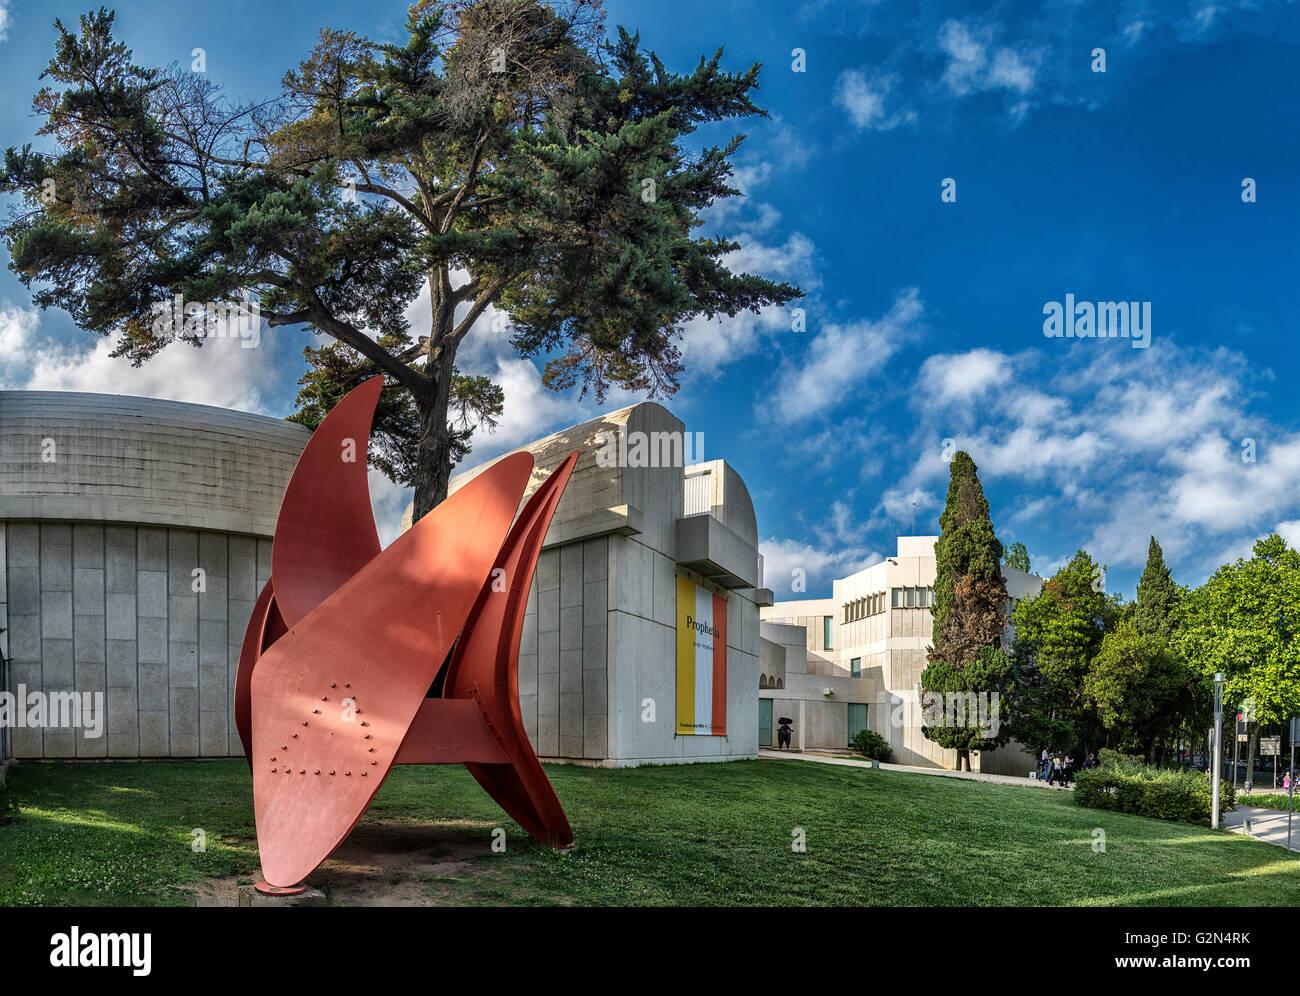 foundation Joan Miro, architect Josep Lluis Sert, Montjuic, Barcelona, Catalonia, Spain - Stock Image